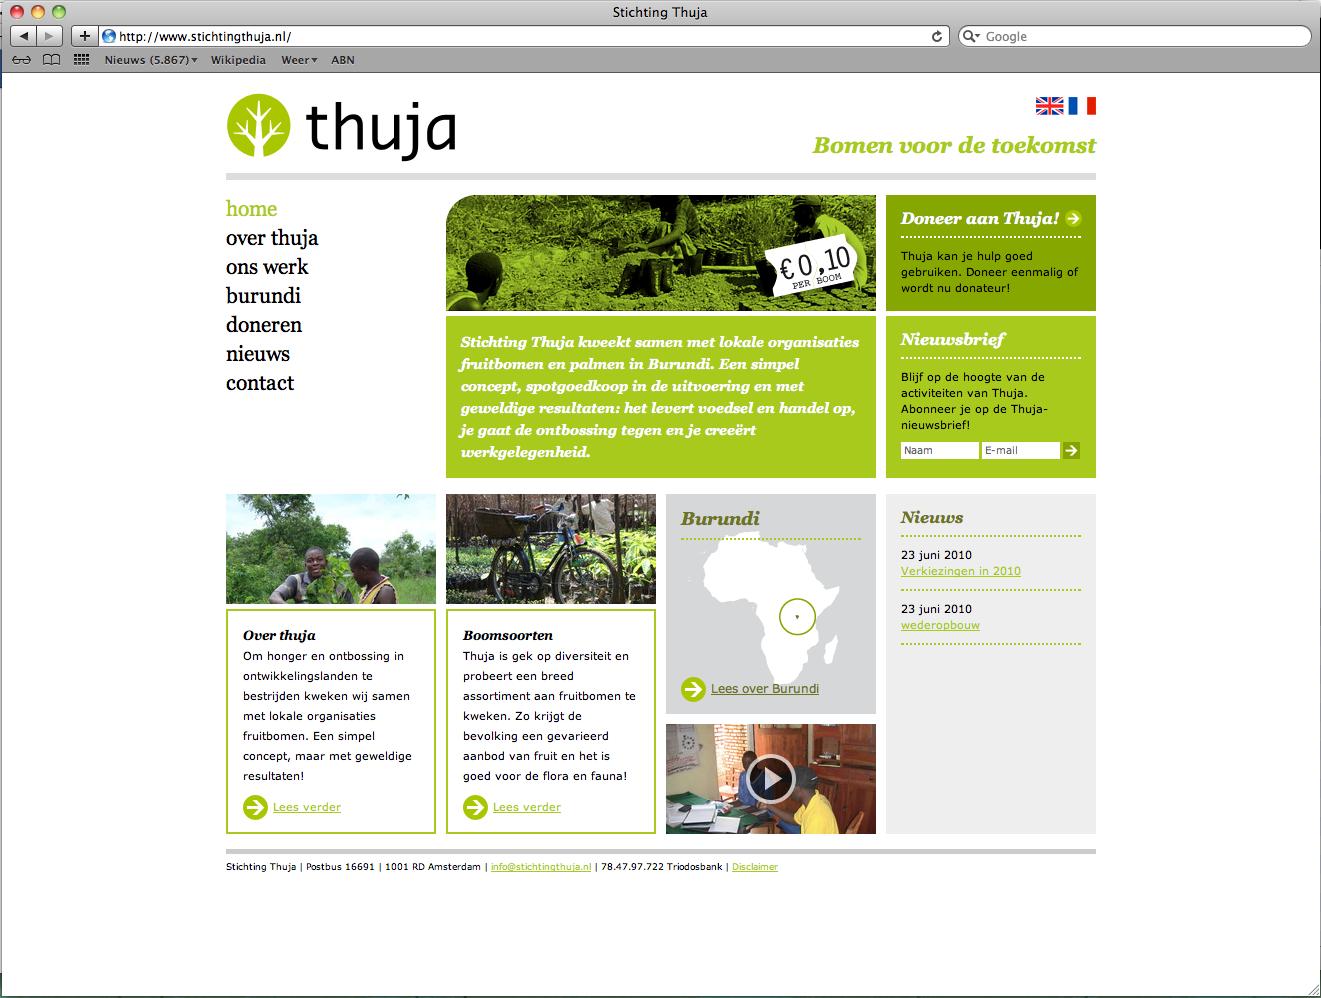 Stichting Thuja